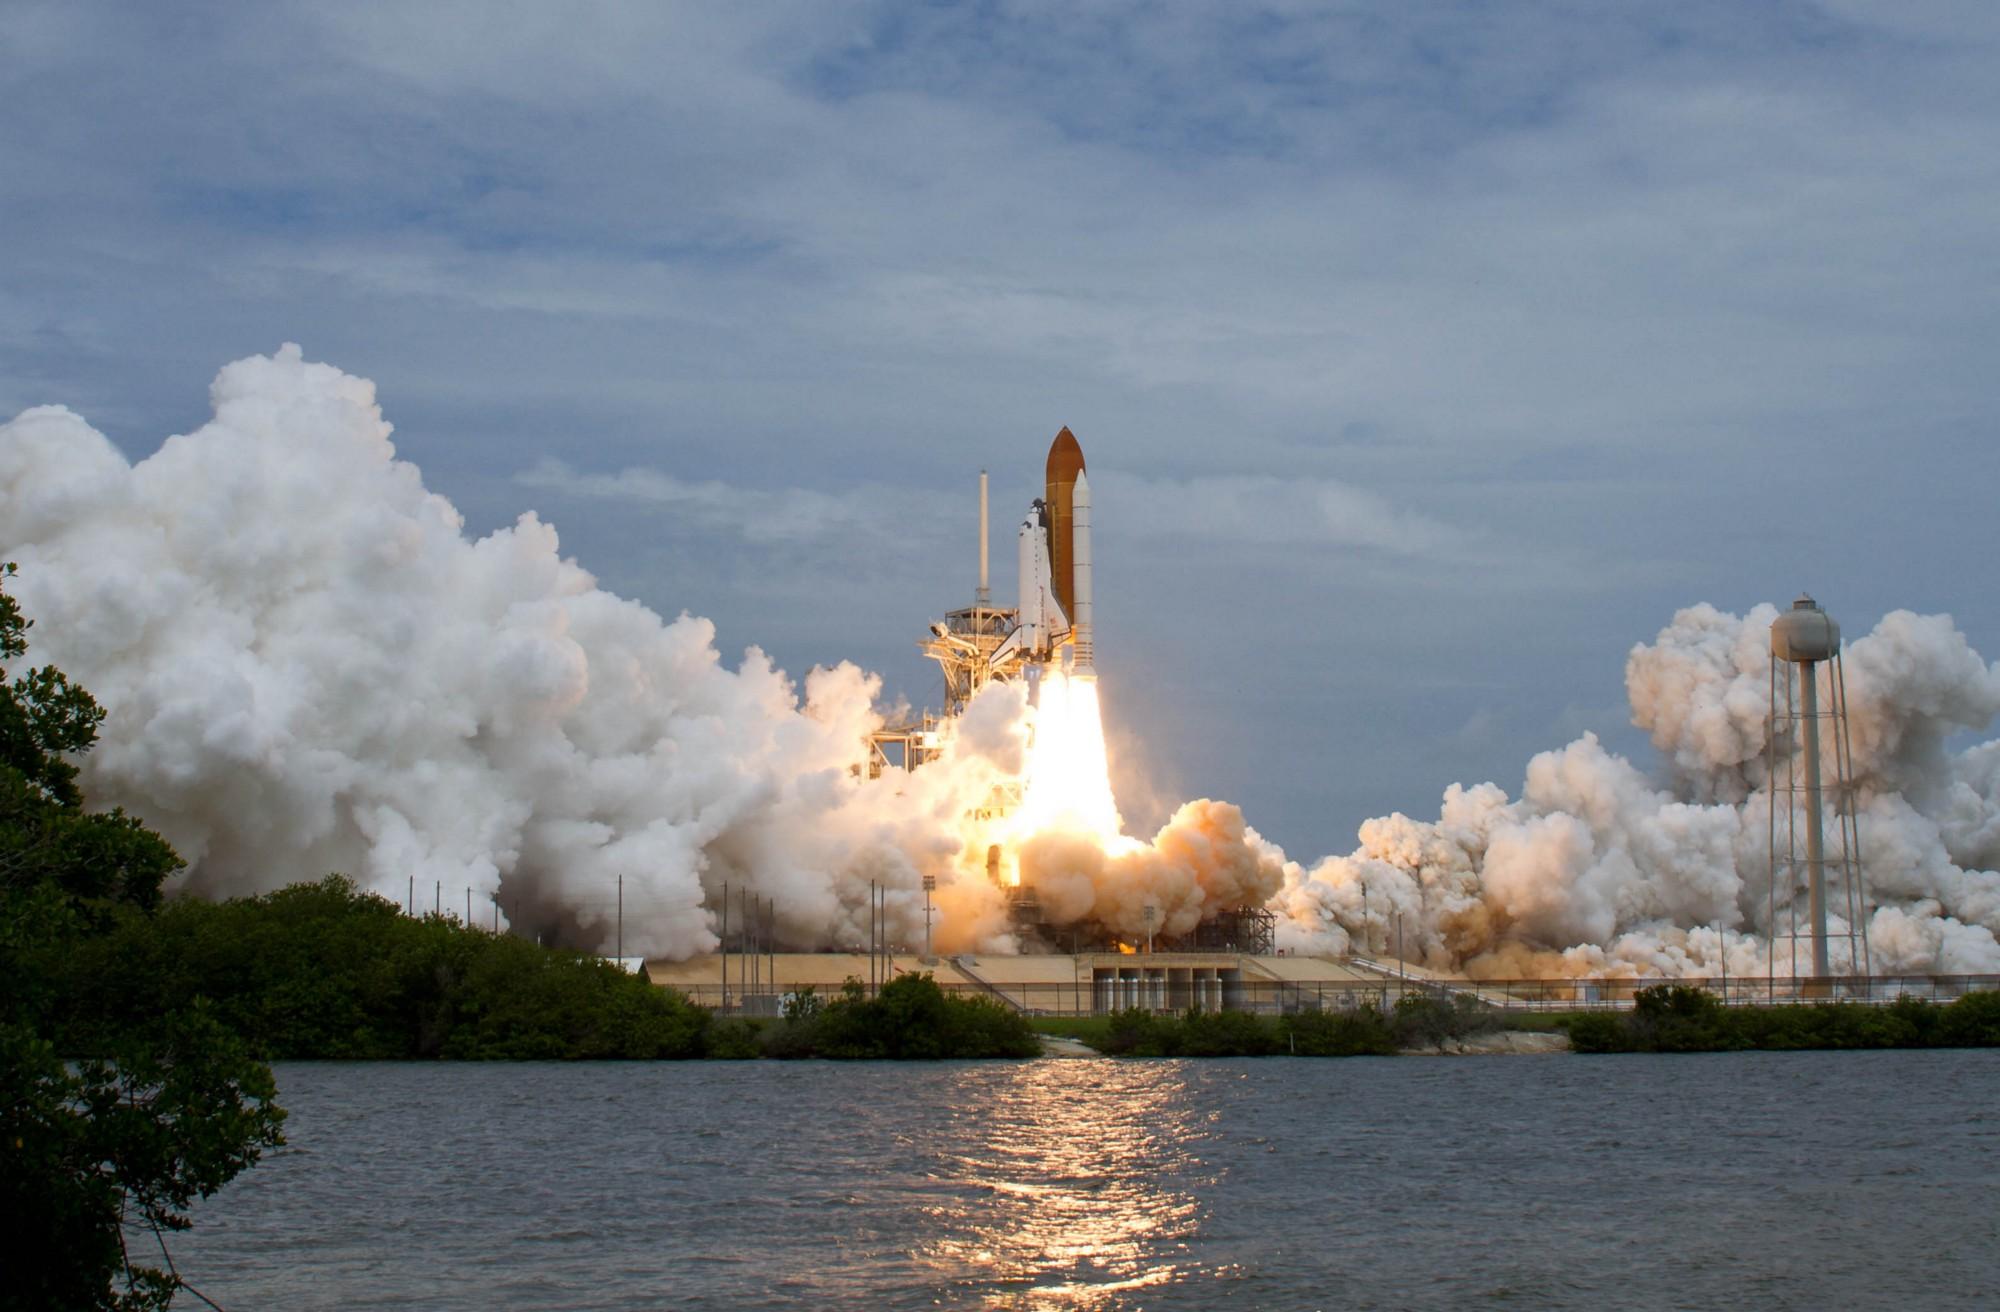 Space shuttle launch photo